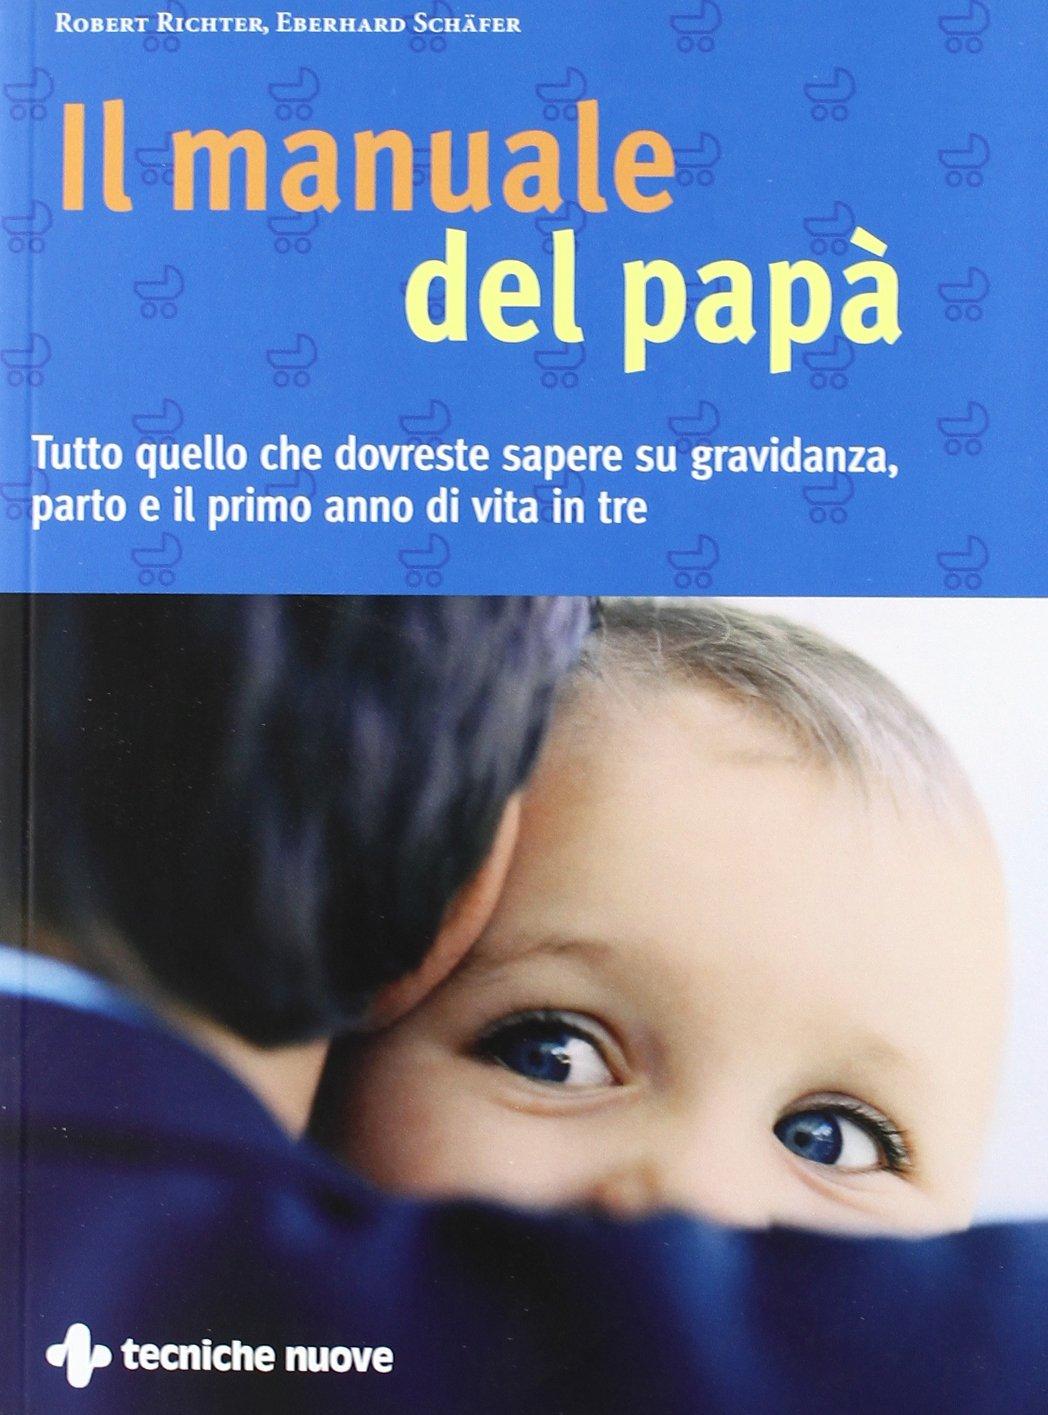 manuale del papà